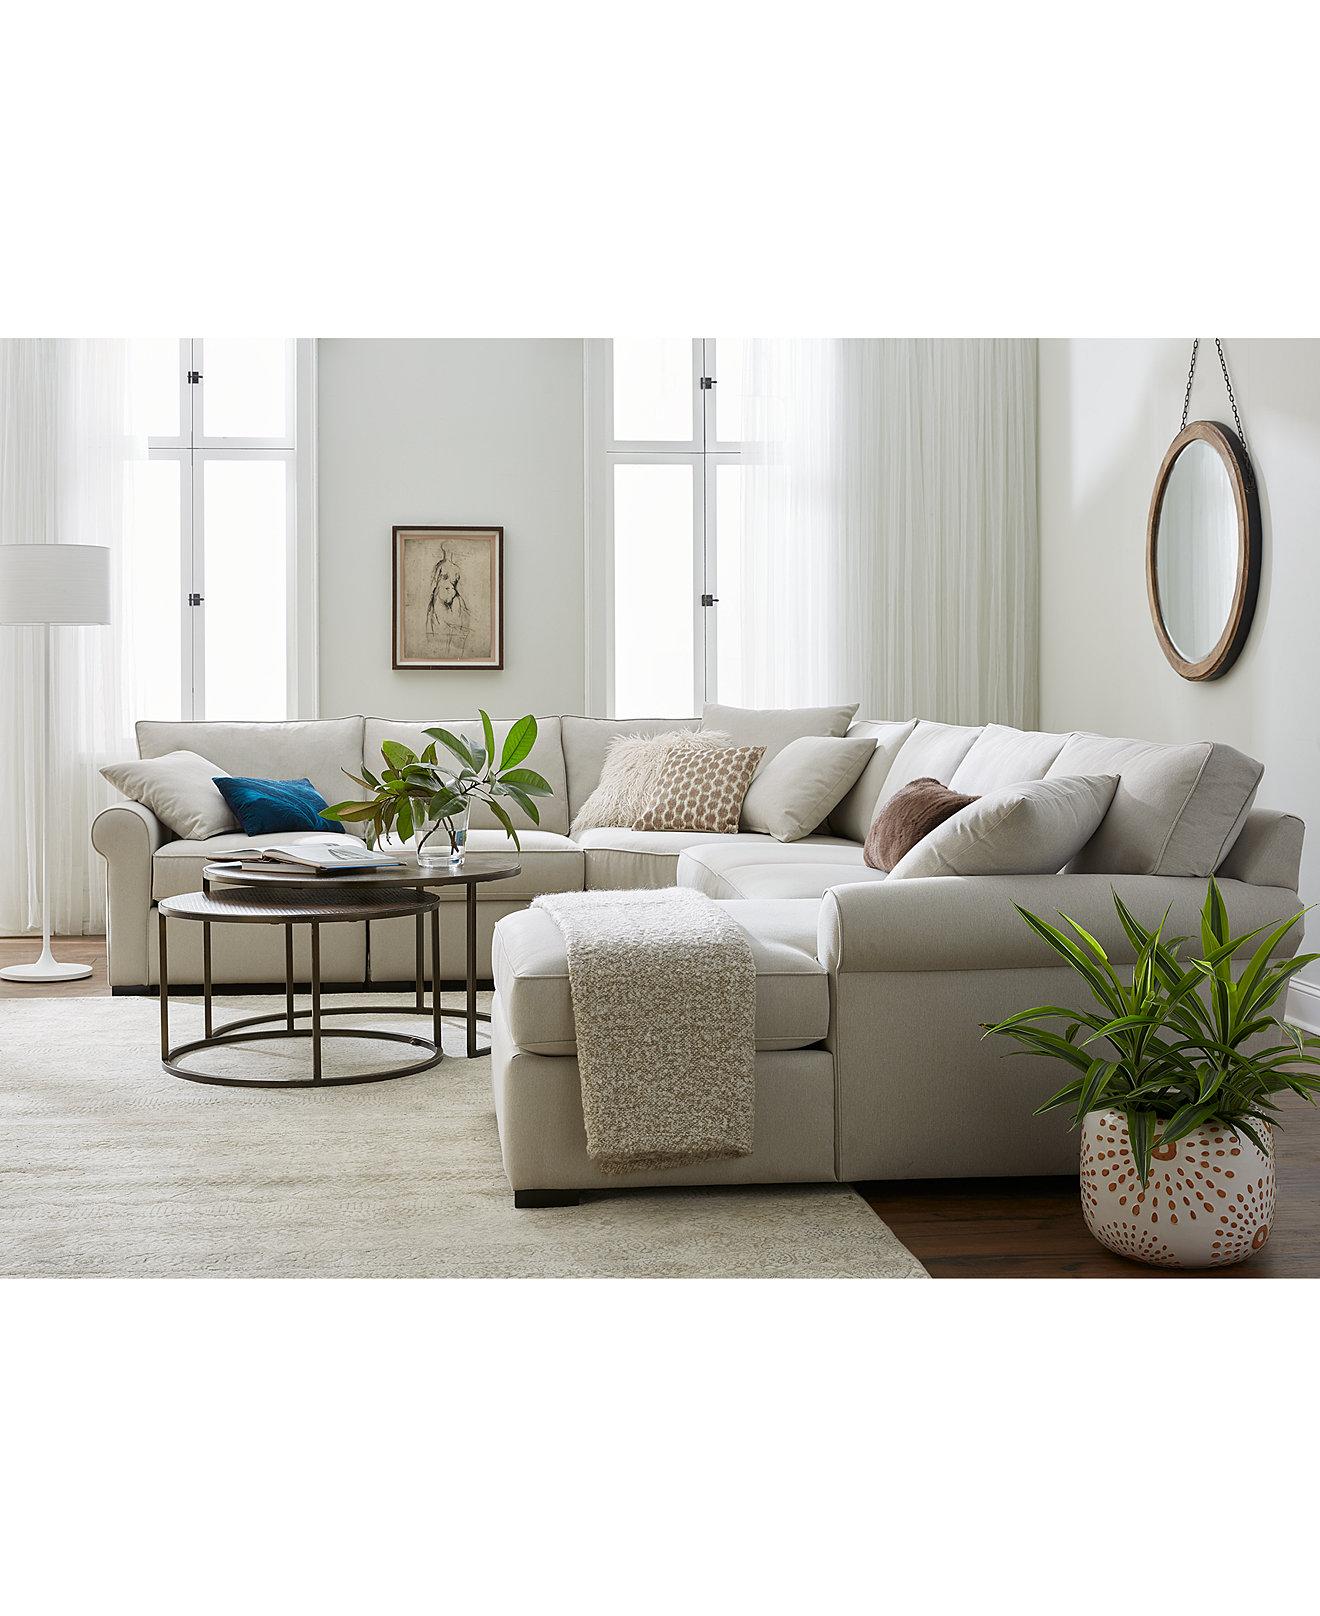 Macys Furnitur: Macys Living Room Sets